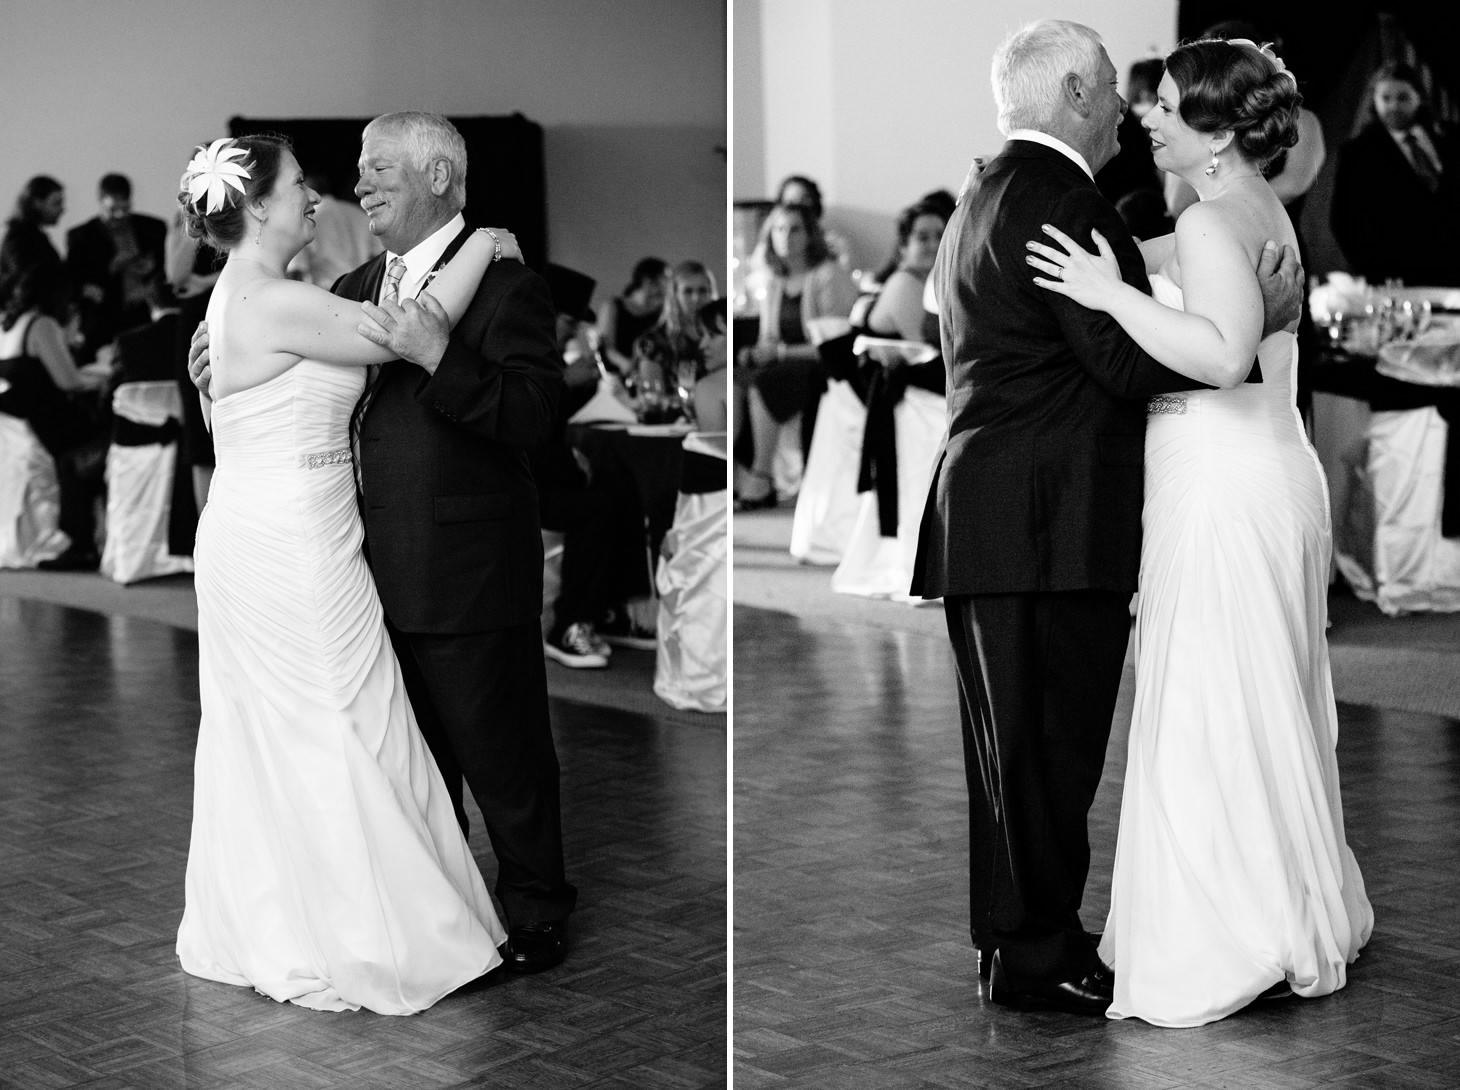 030-nyc-wedding-photographer-nj-nerdy-dr-who-firehouse-wedding-smitten-chickens.jpg